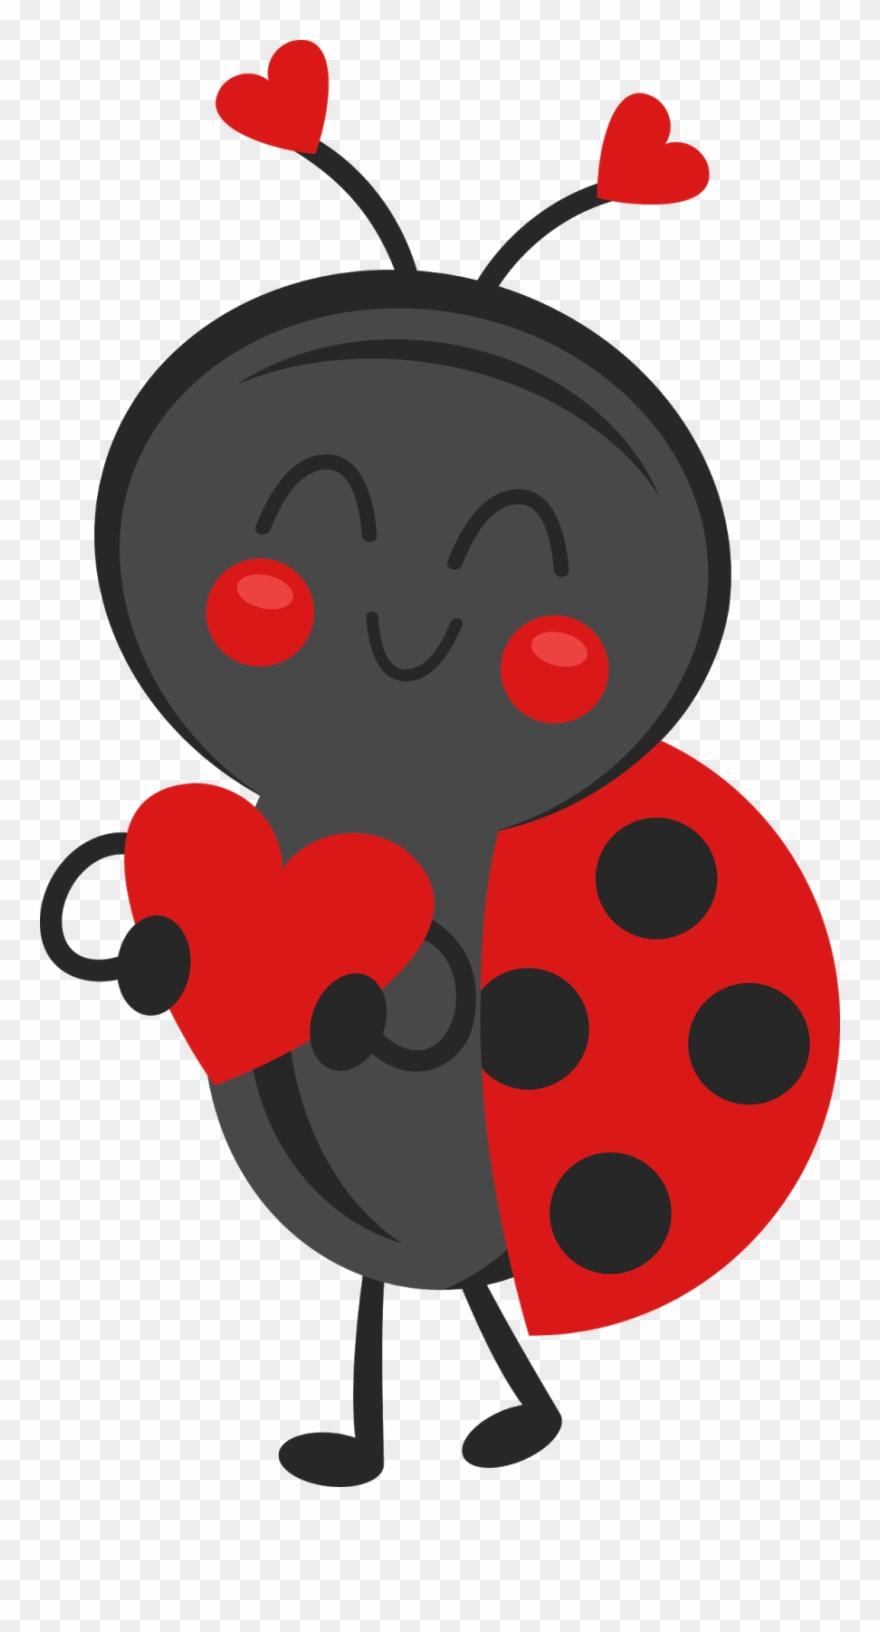 medium resolution of bug clipart valentine valentines ladybug clip art png download